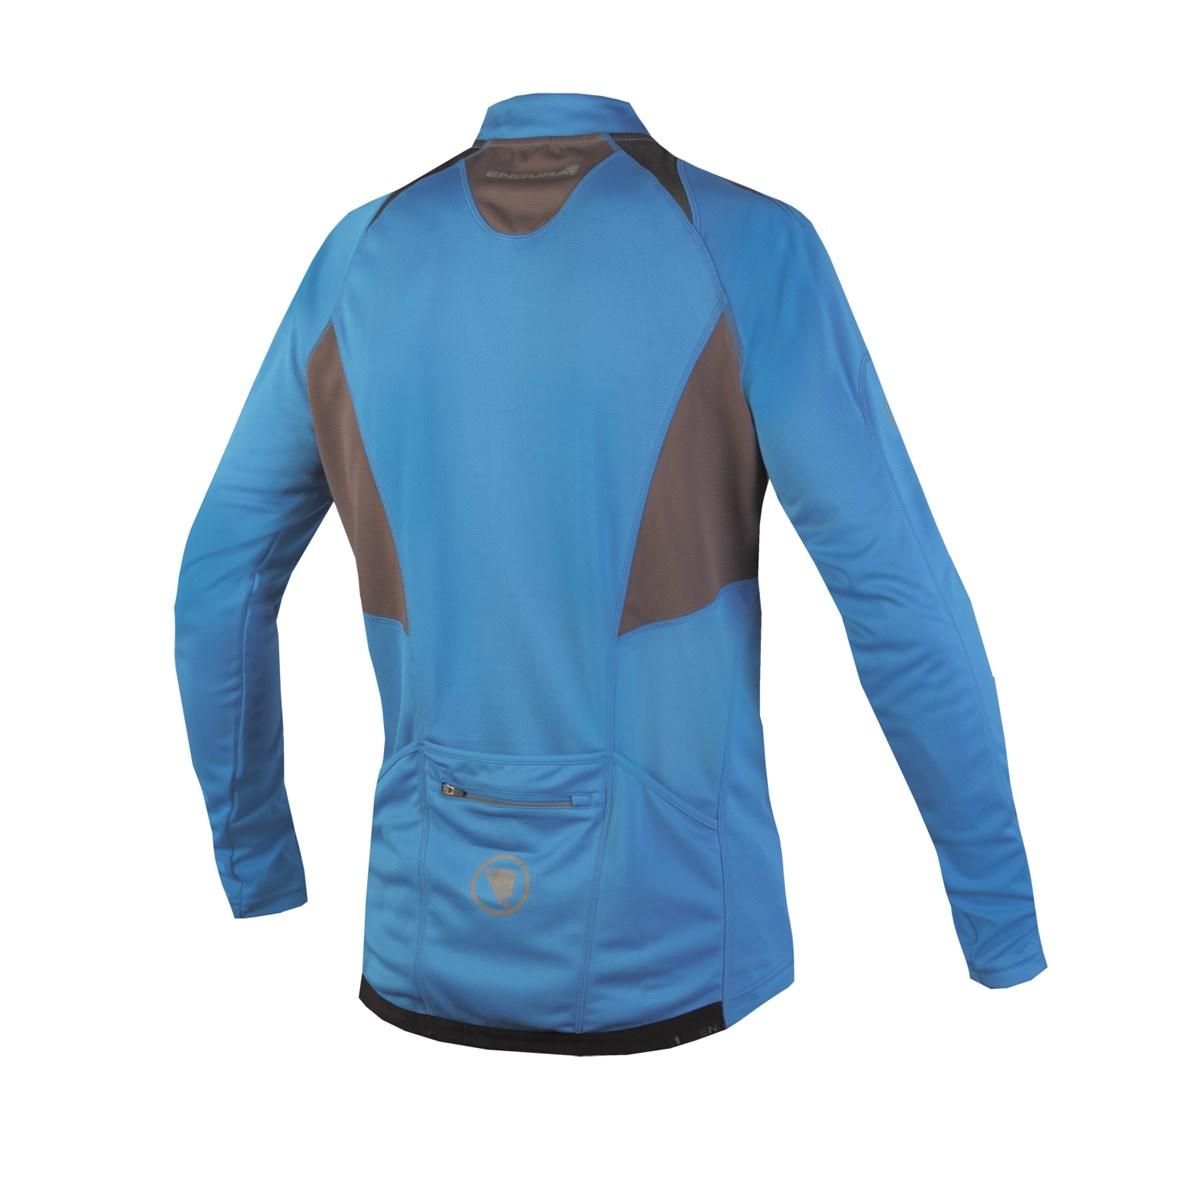 Endura Hummvee II Long Sleeve Blue Cycling Jersey £34.99 7528d11ce